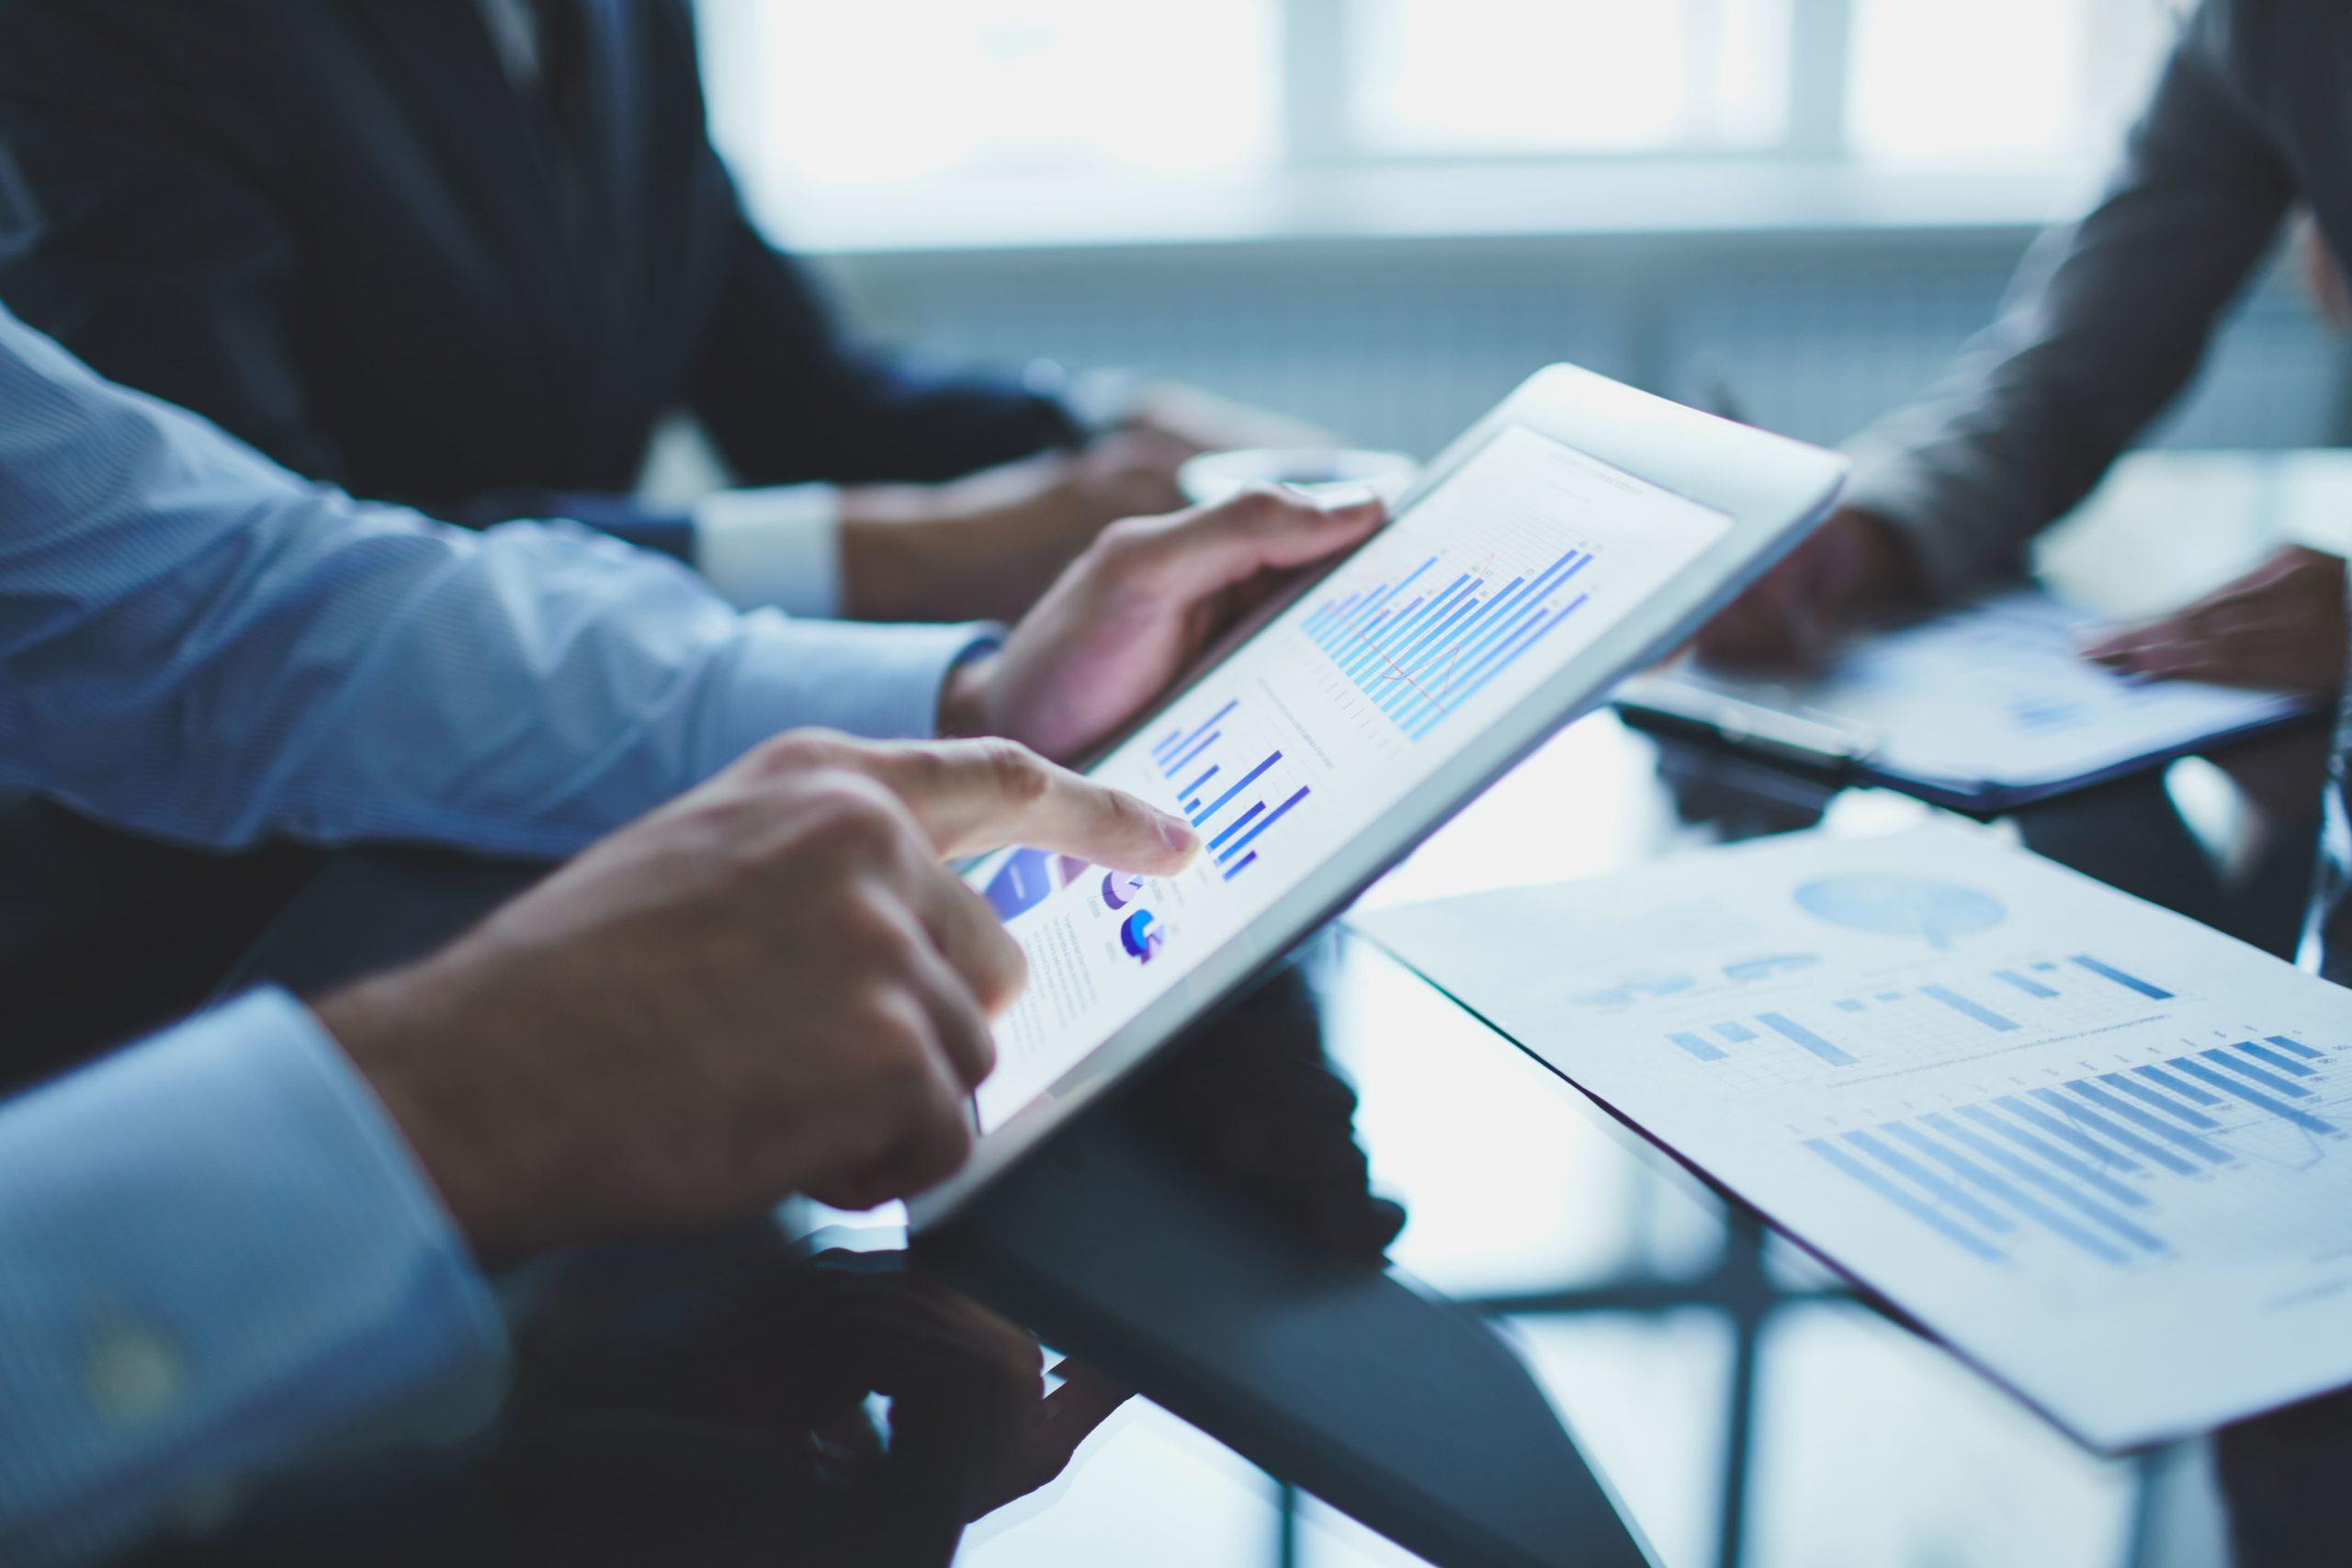 análisis de auditoría comercial